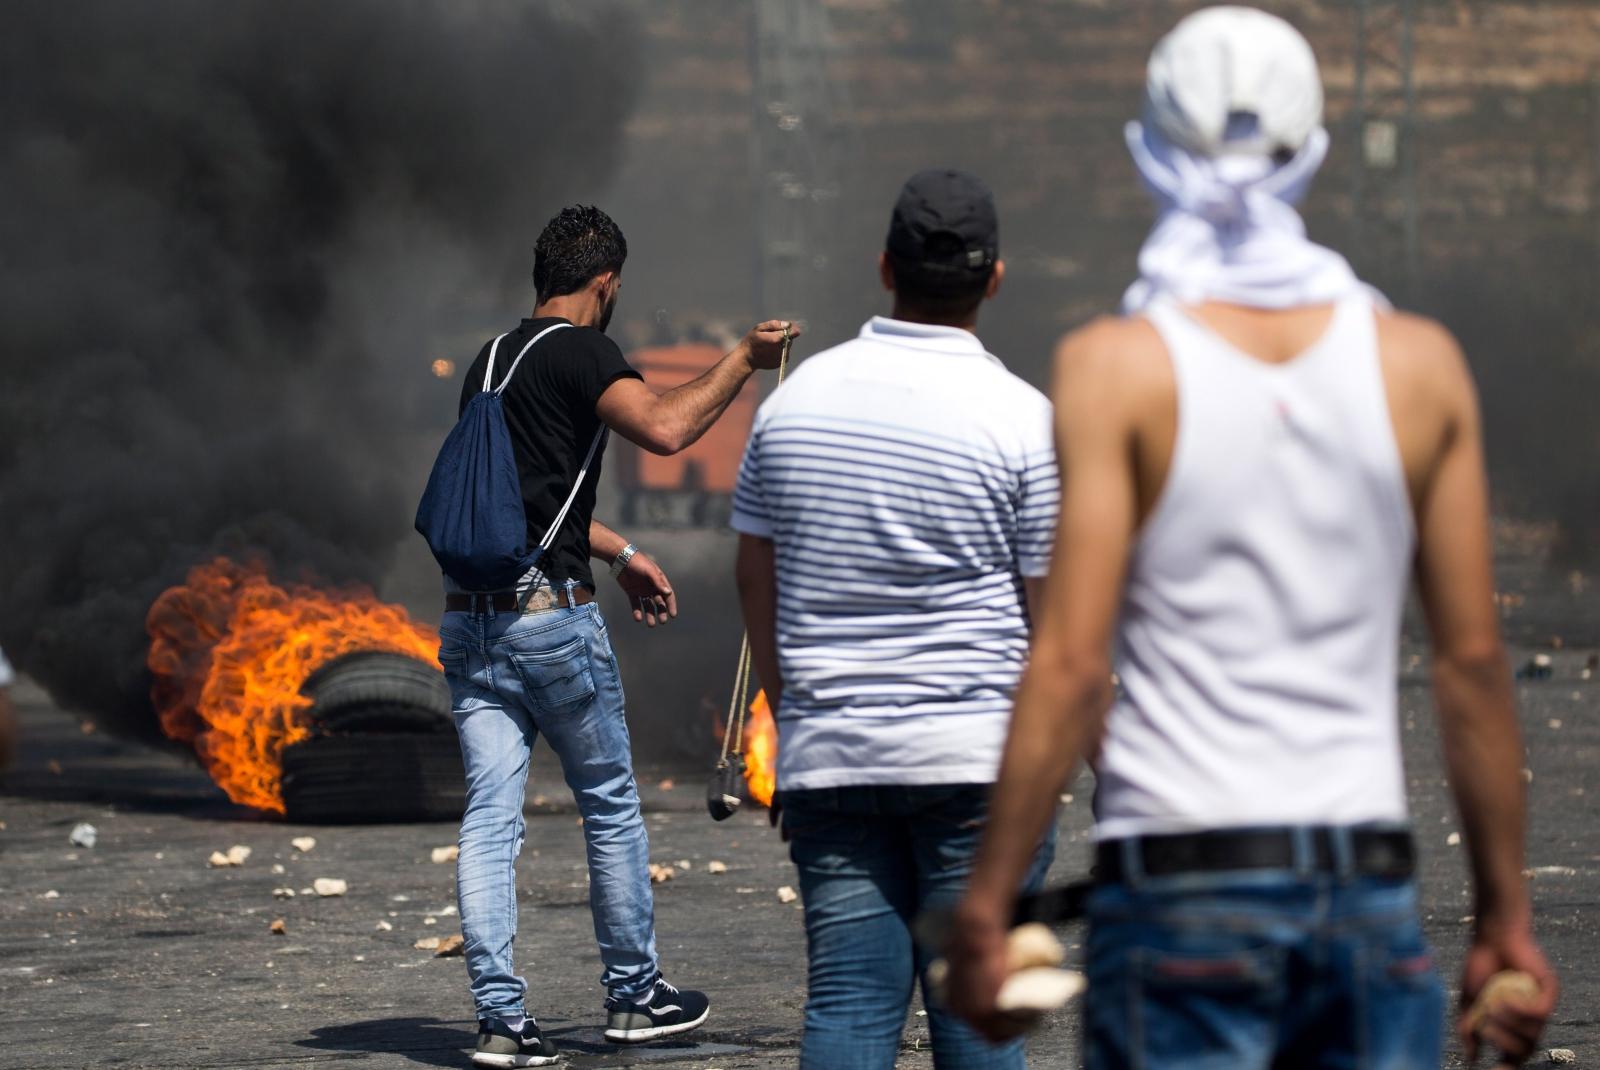 Konflikt palestyńsko-izraelski. fot. EPA/ATEF SAFADI